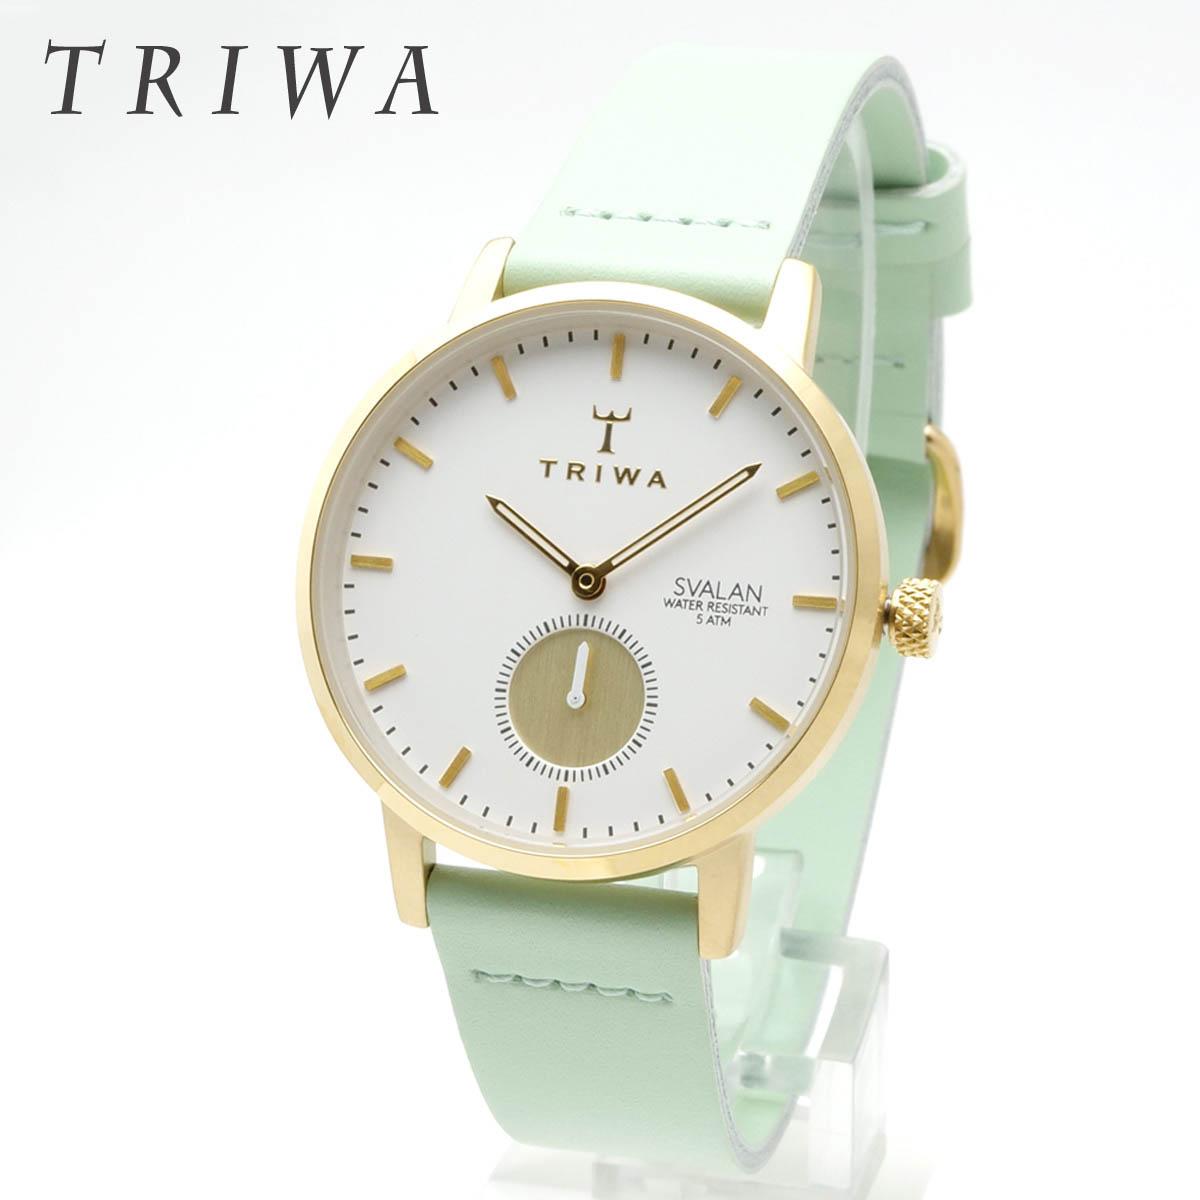 TRIWA トリワ Ivory Svalan SVST105-SS113113 アイボリー スヴァラン Mint Classic Super Slim ミントグリーン スーパースリム スバラン 33mm径 レディースモデル スモールセコンド アナログ 女性用腕時計 薄型 軽量